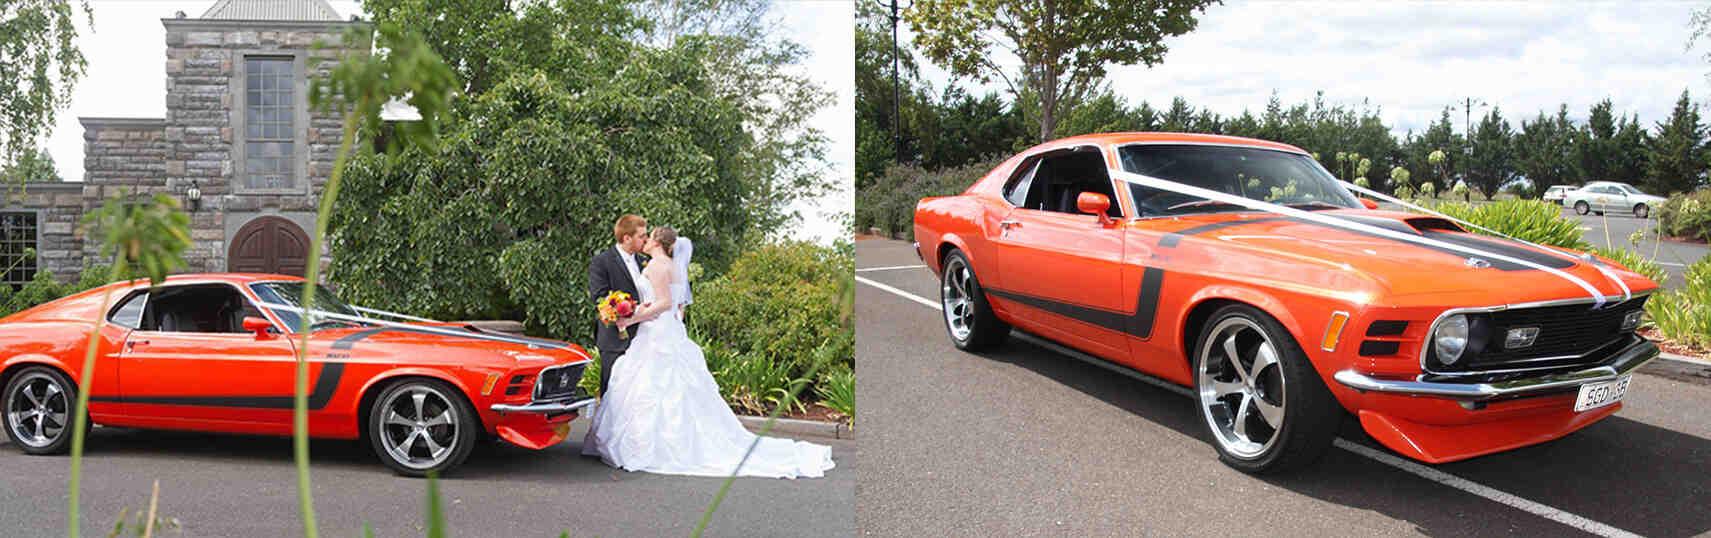 wedding-cars-prices.jpg